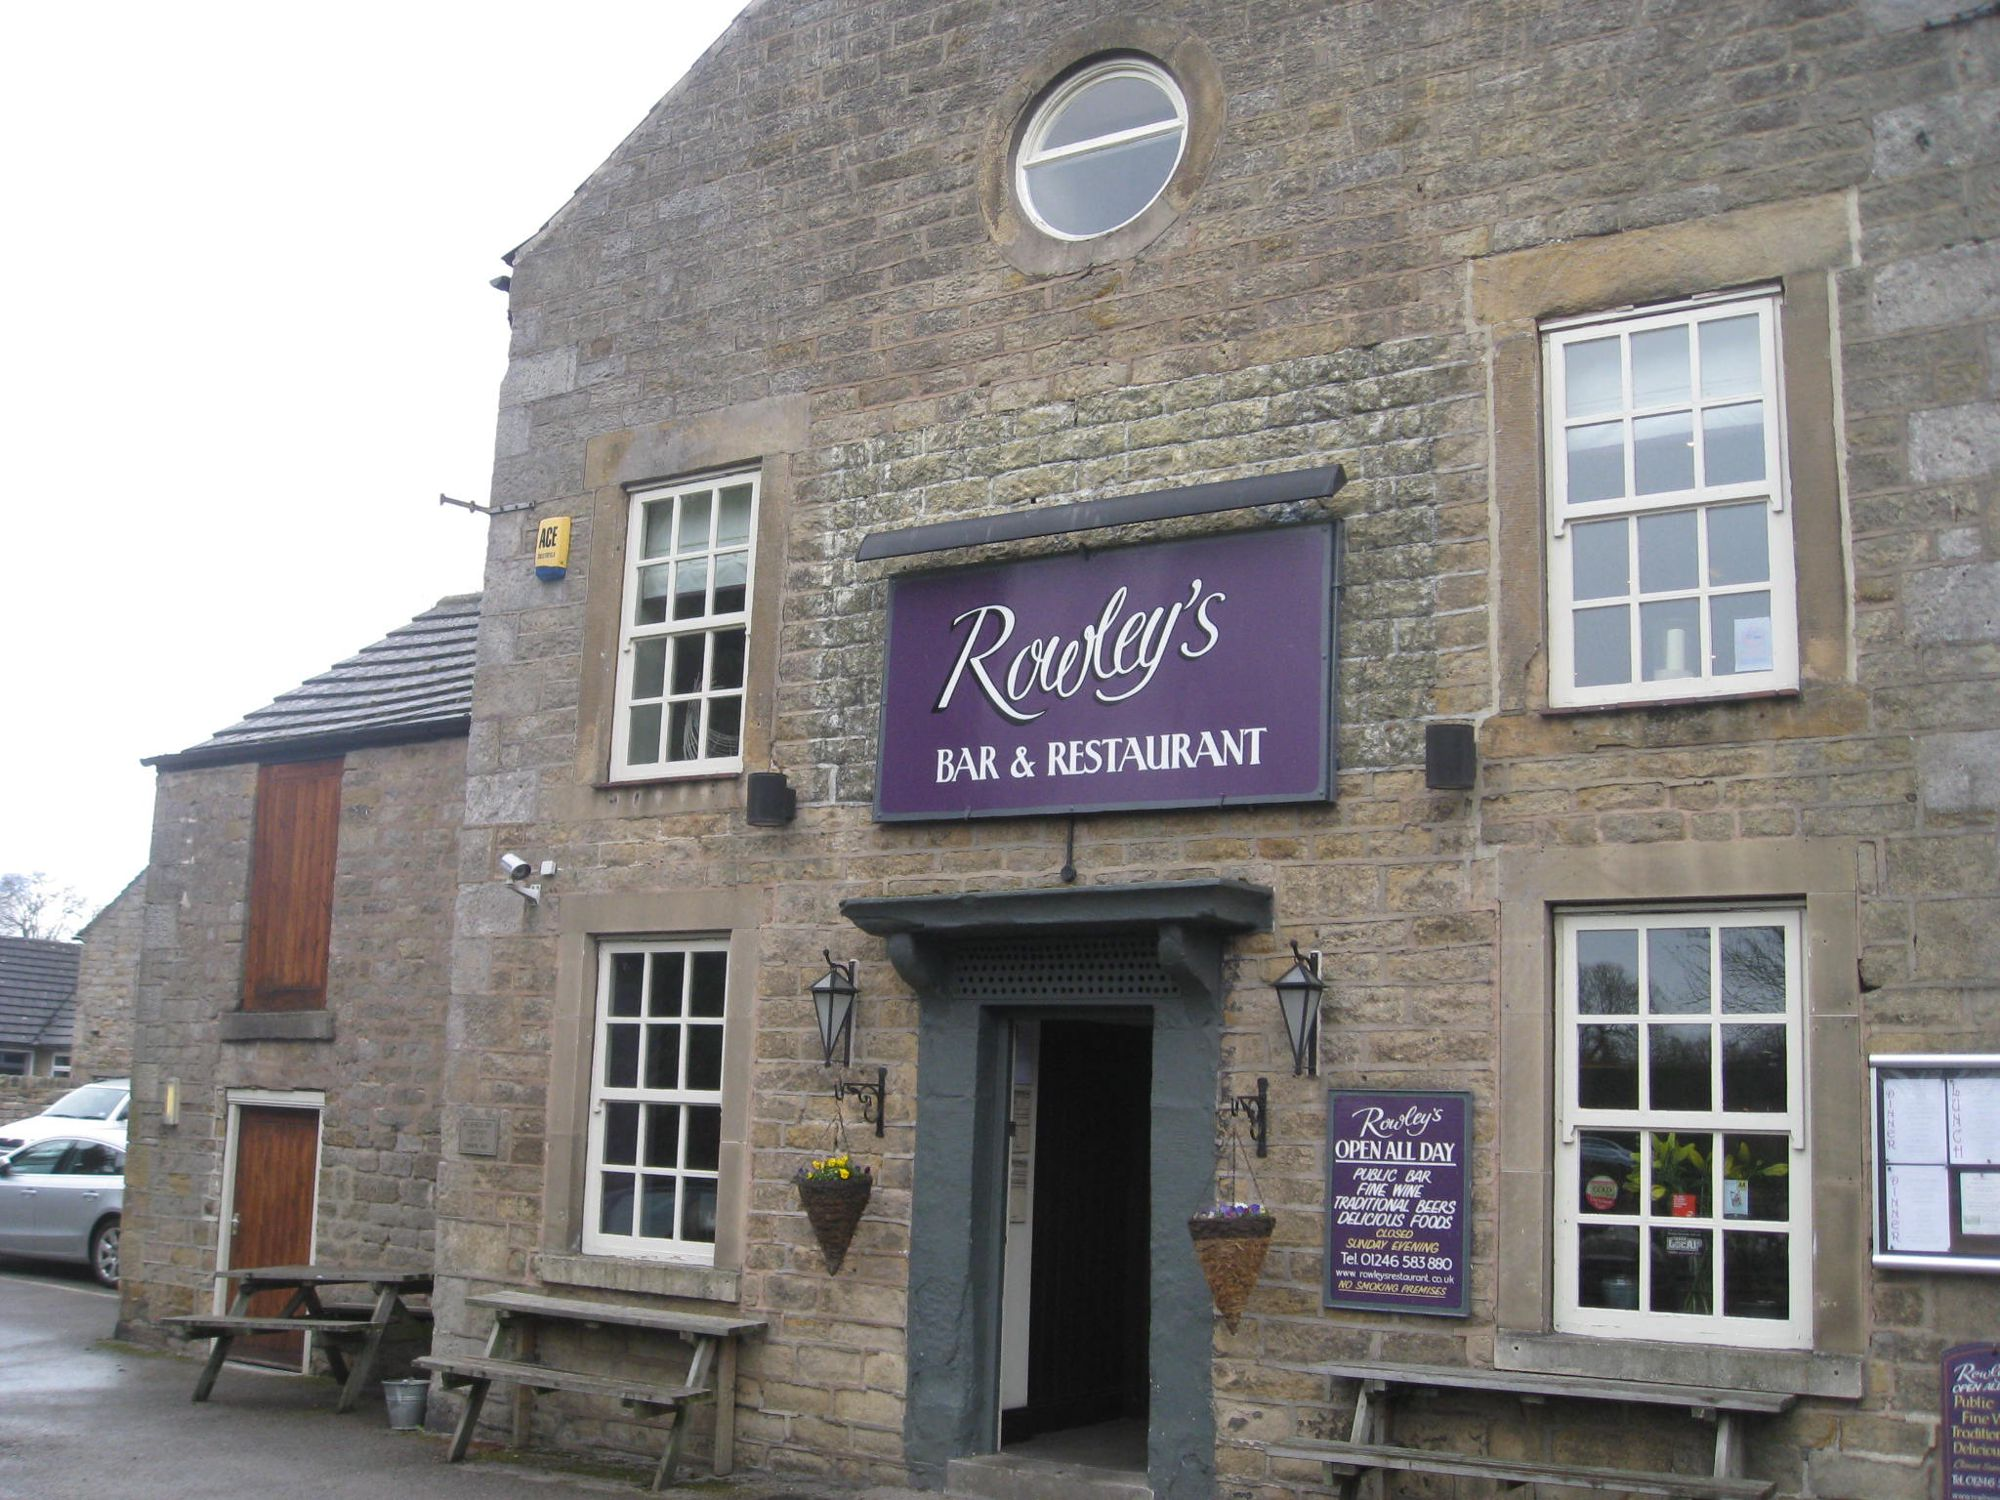 Rowleys, Baslow, Derbyshire